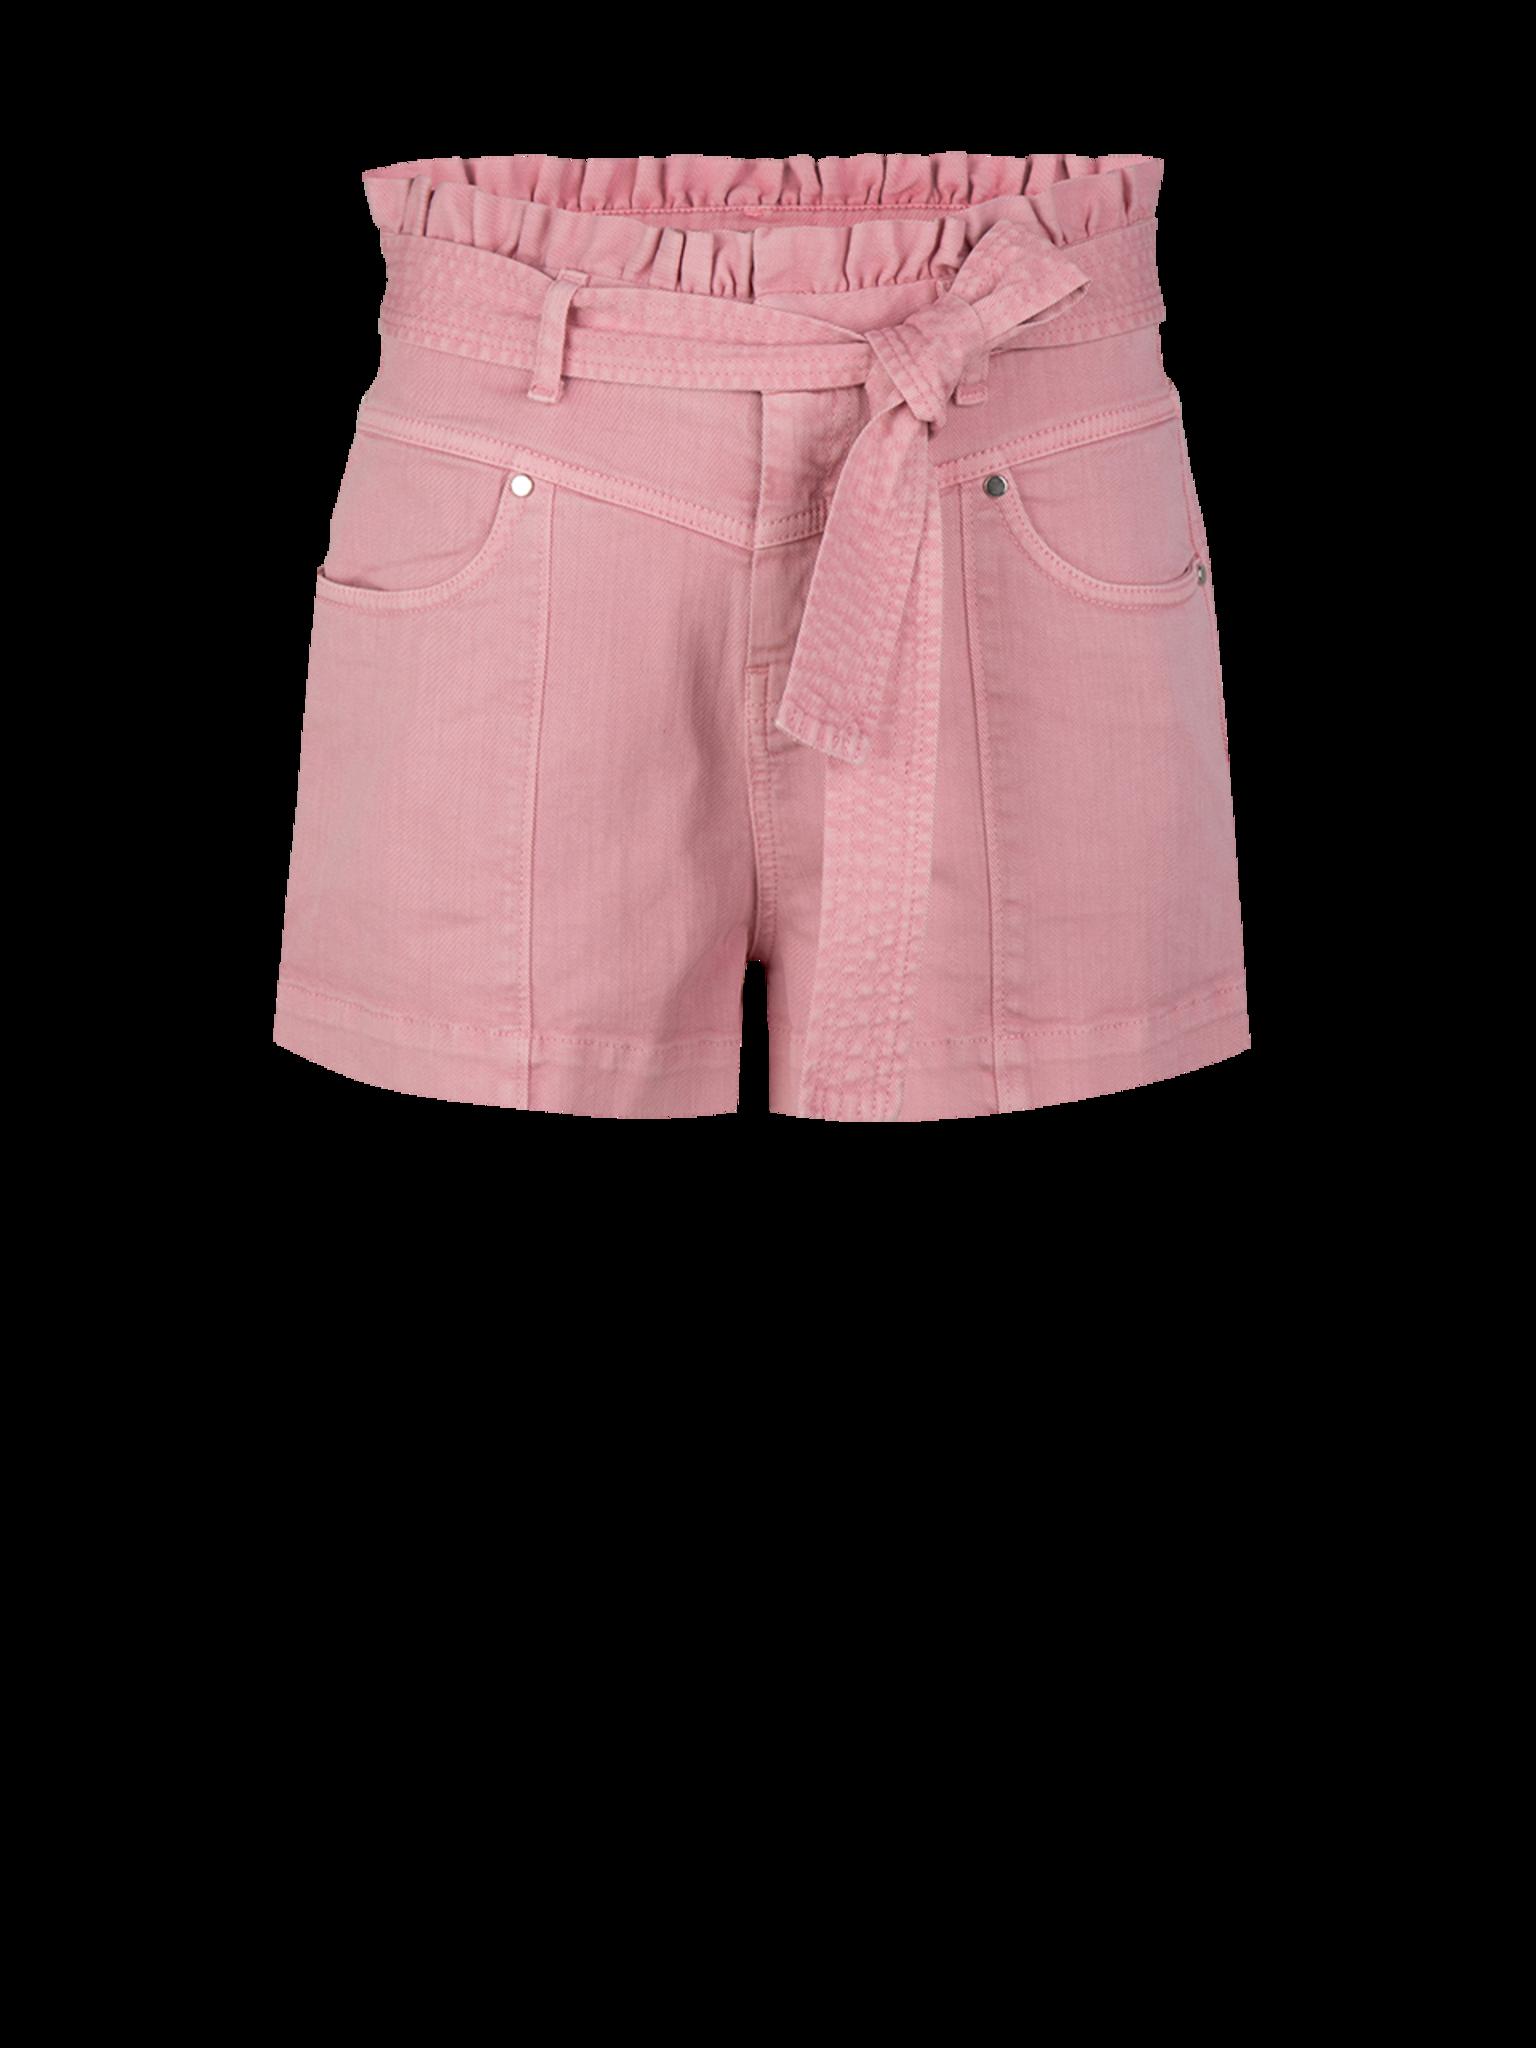 Short Isola pink-1